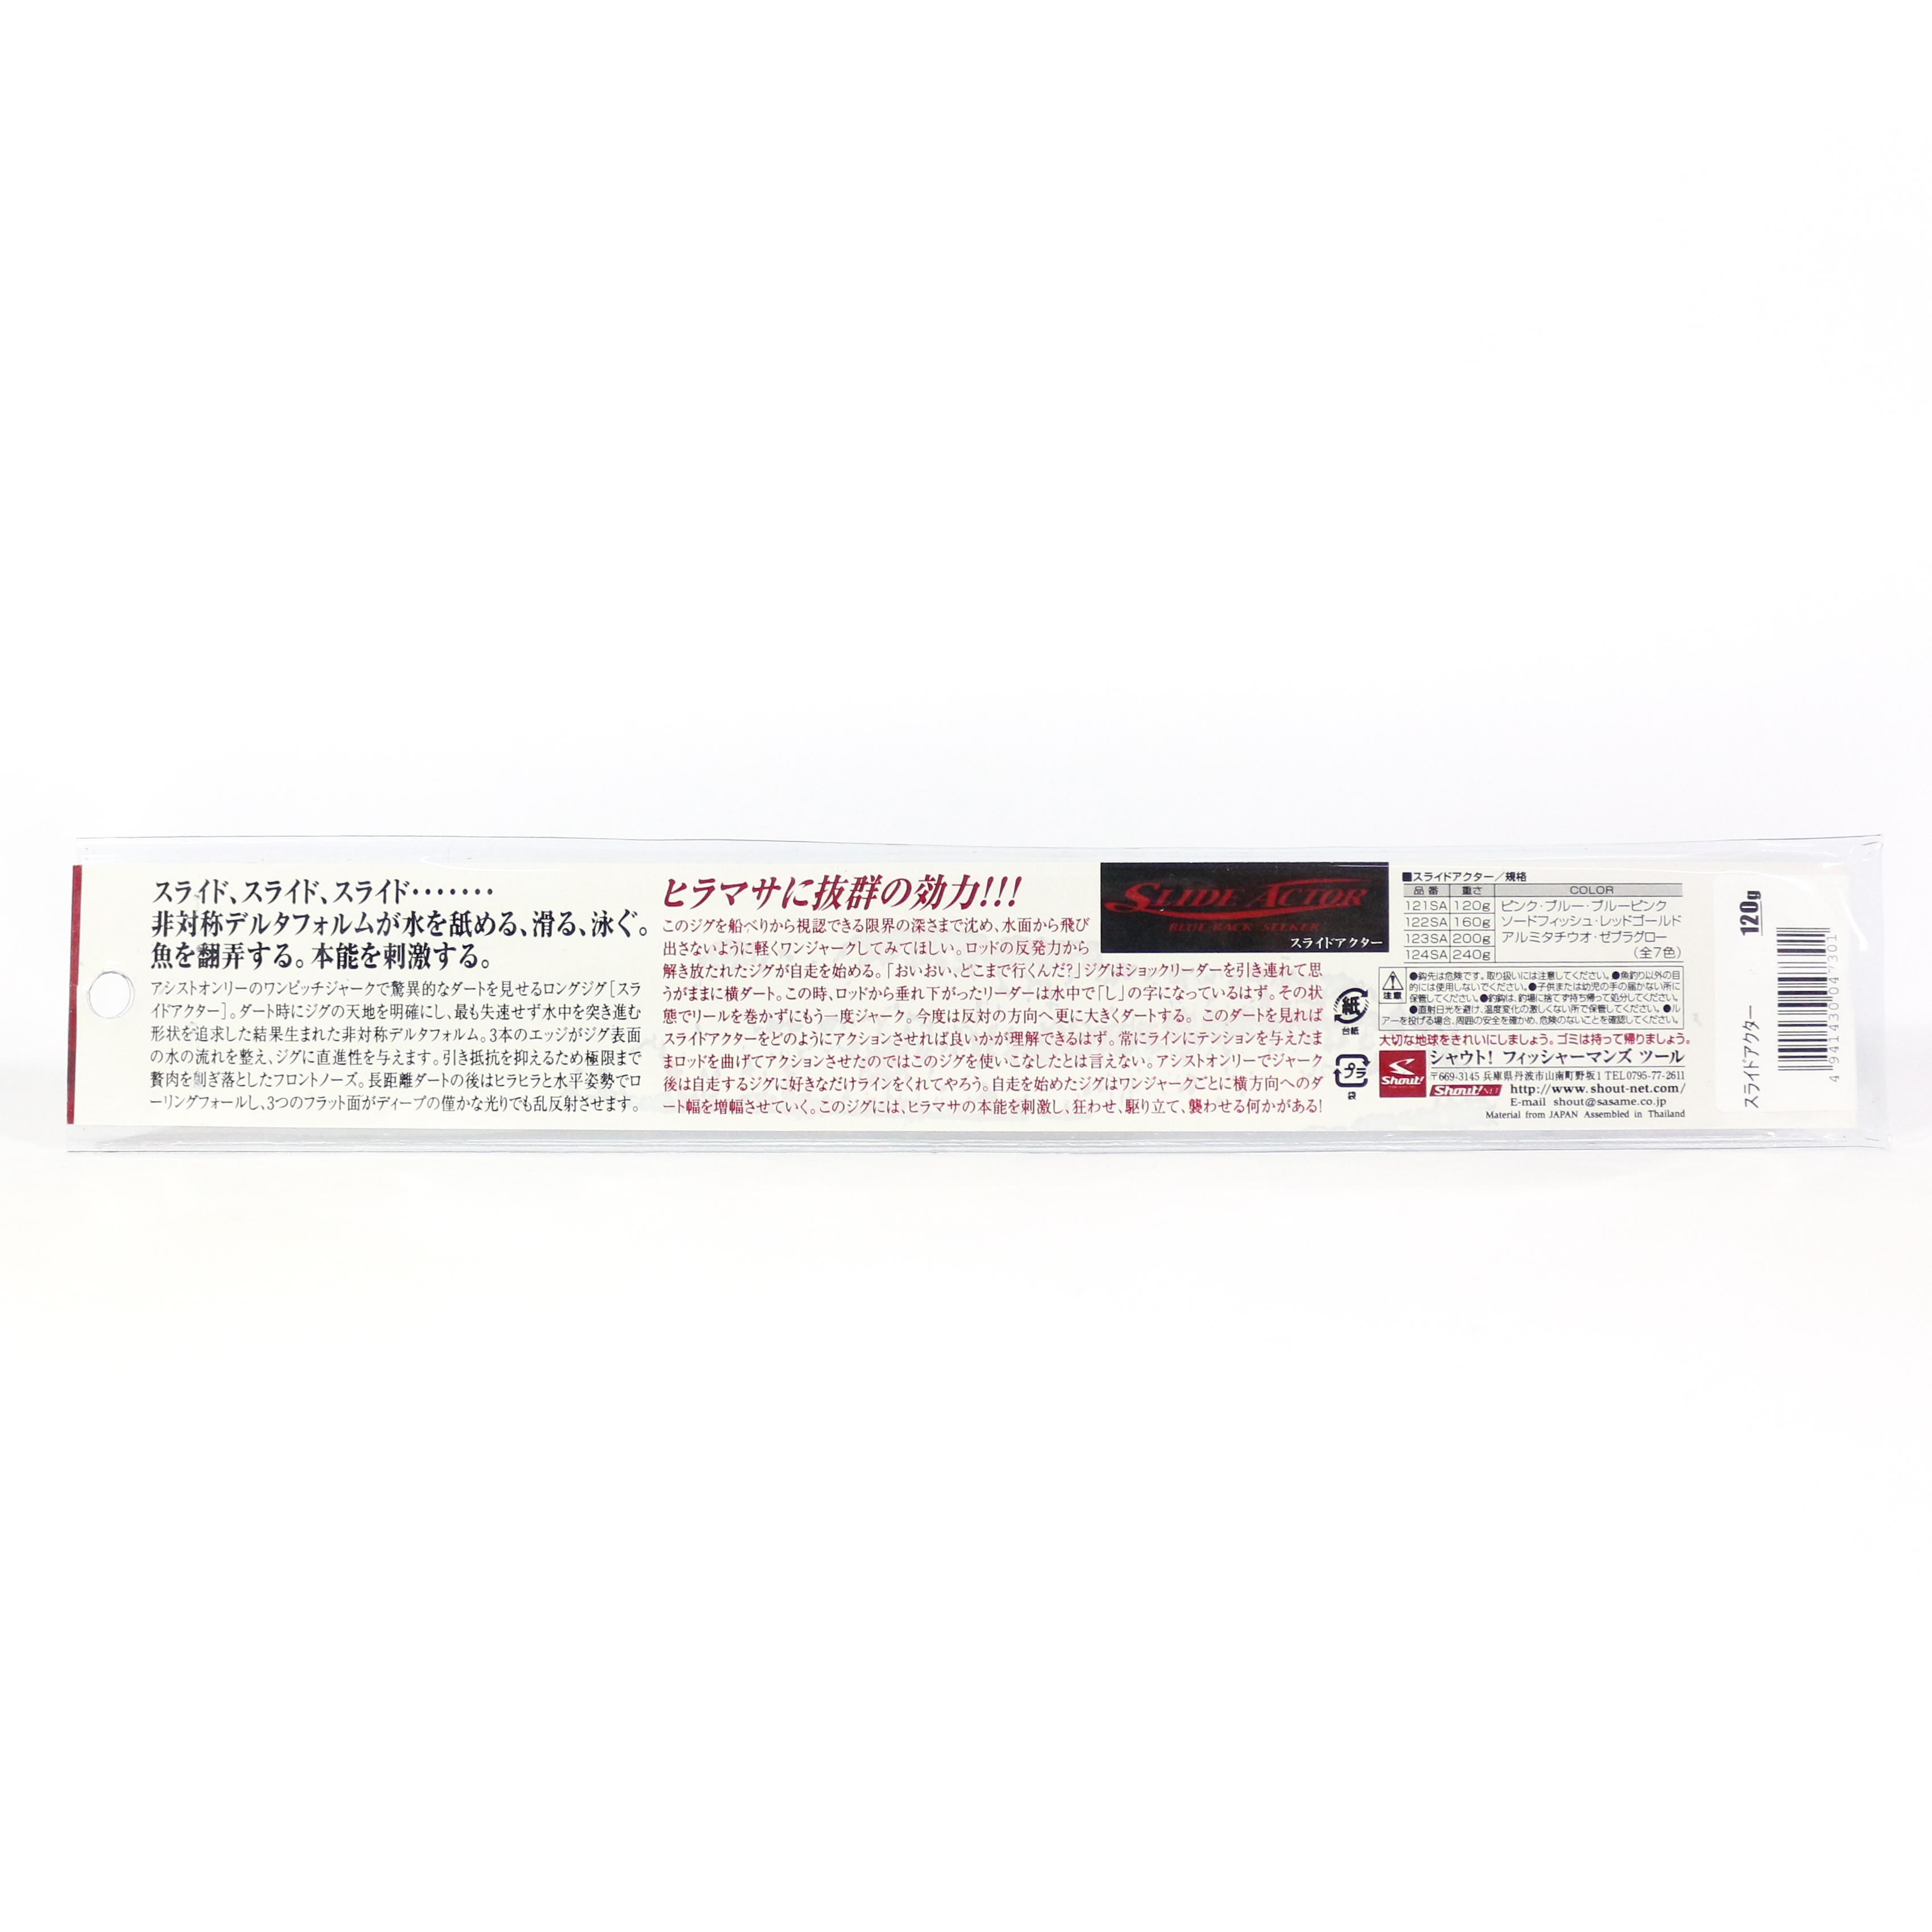 7295 Shout 121-SA Metal Jig Slide Actor Long 120 grams SF